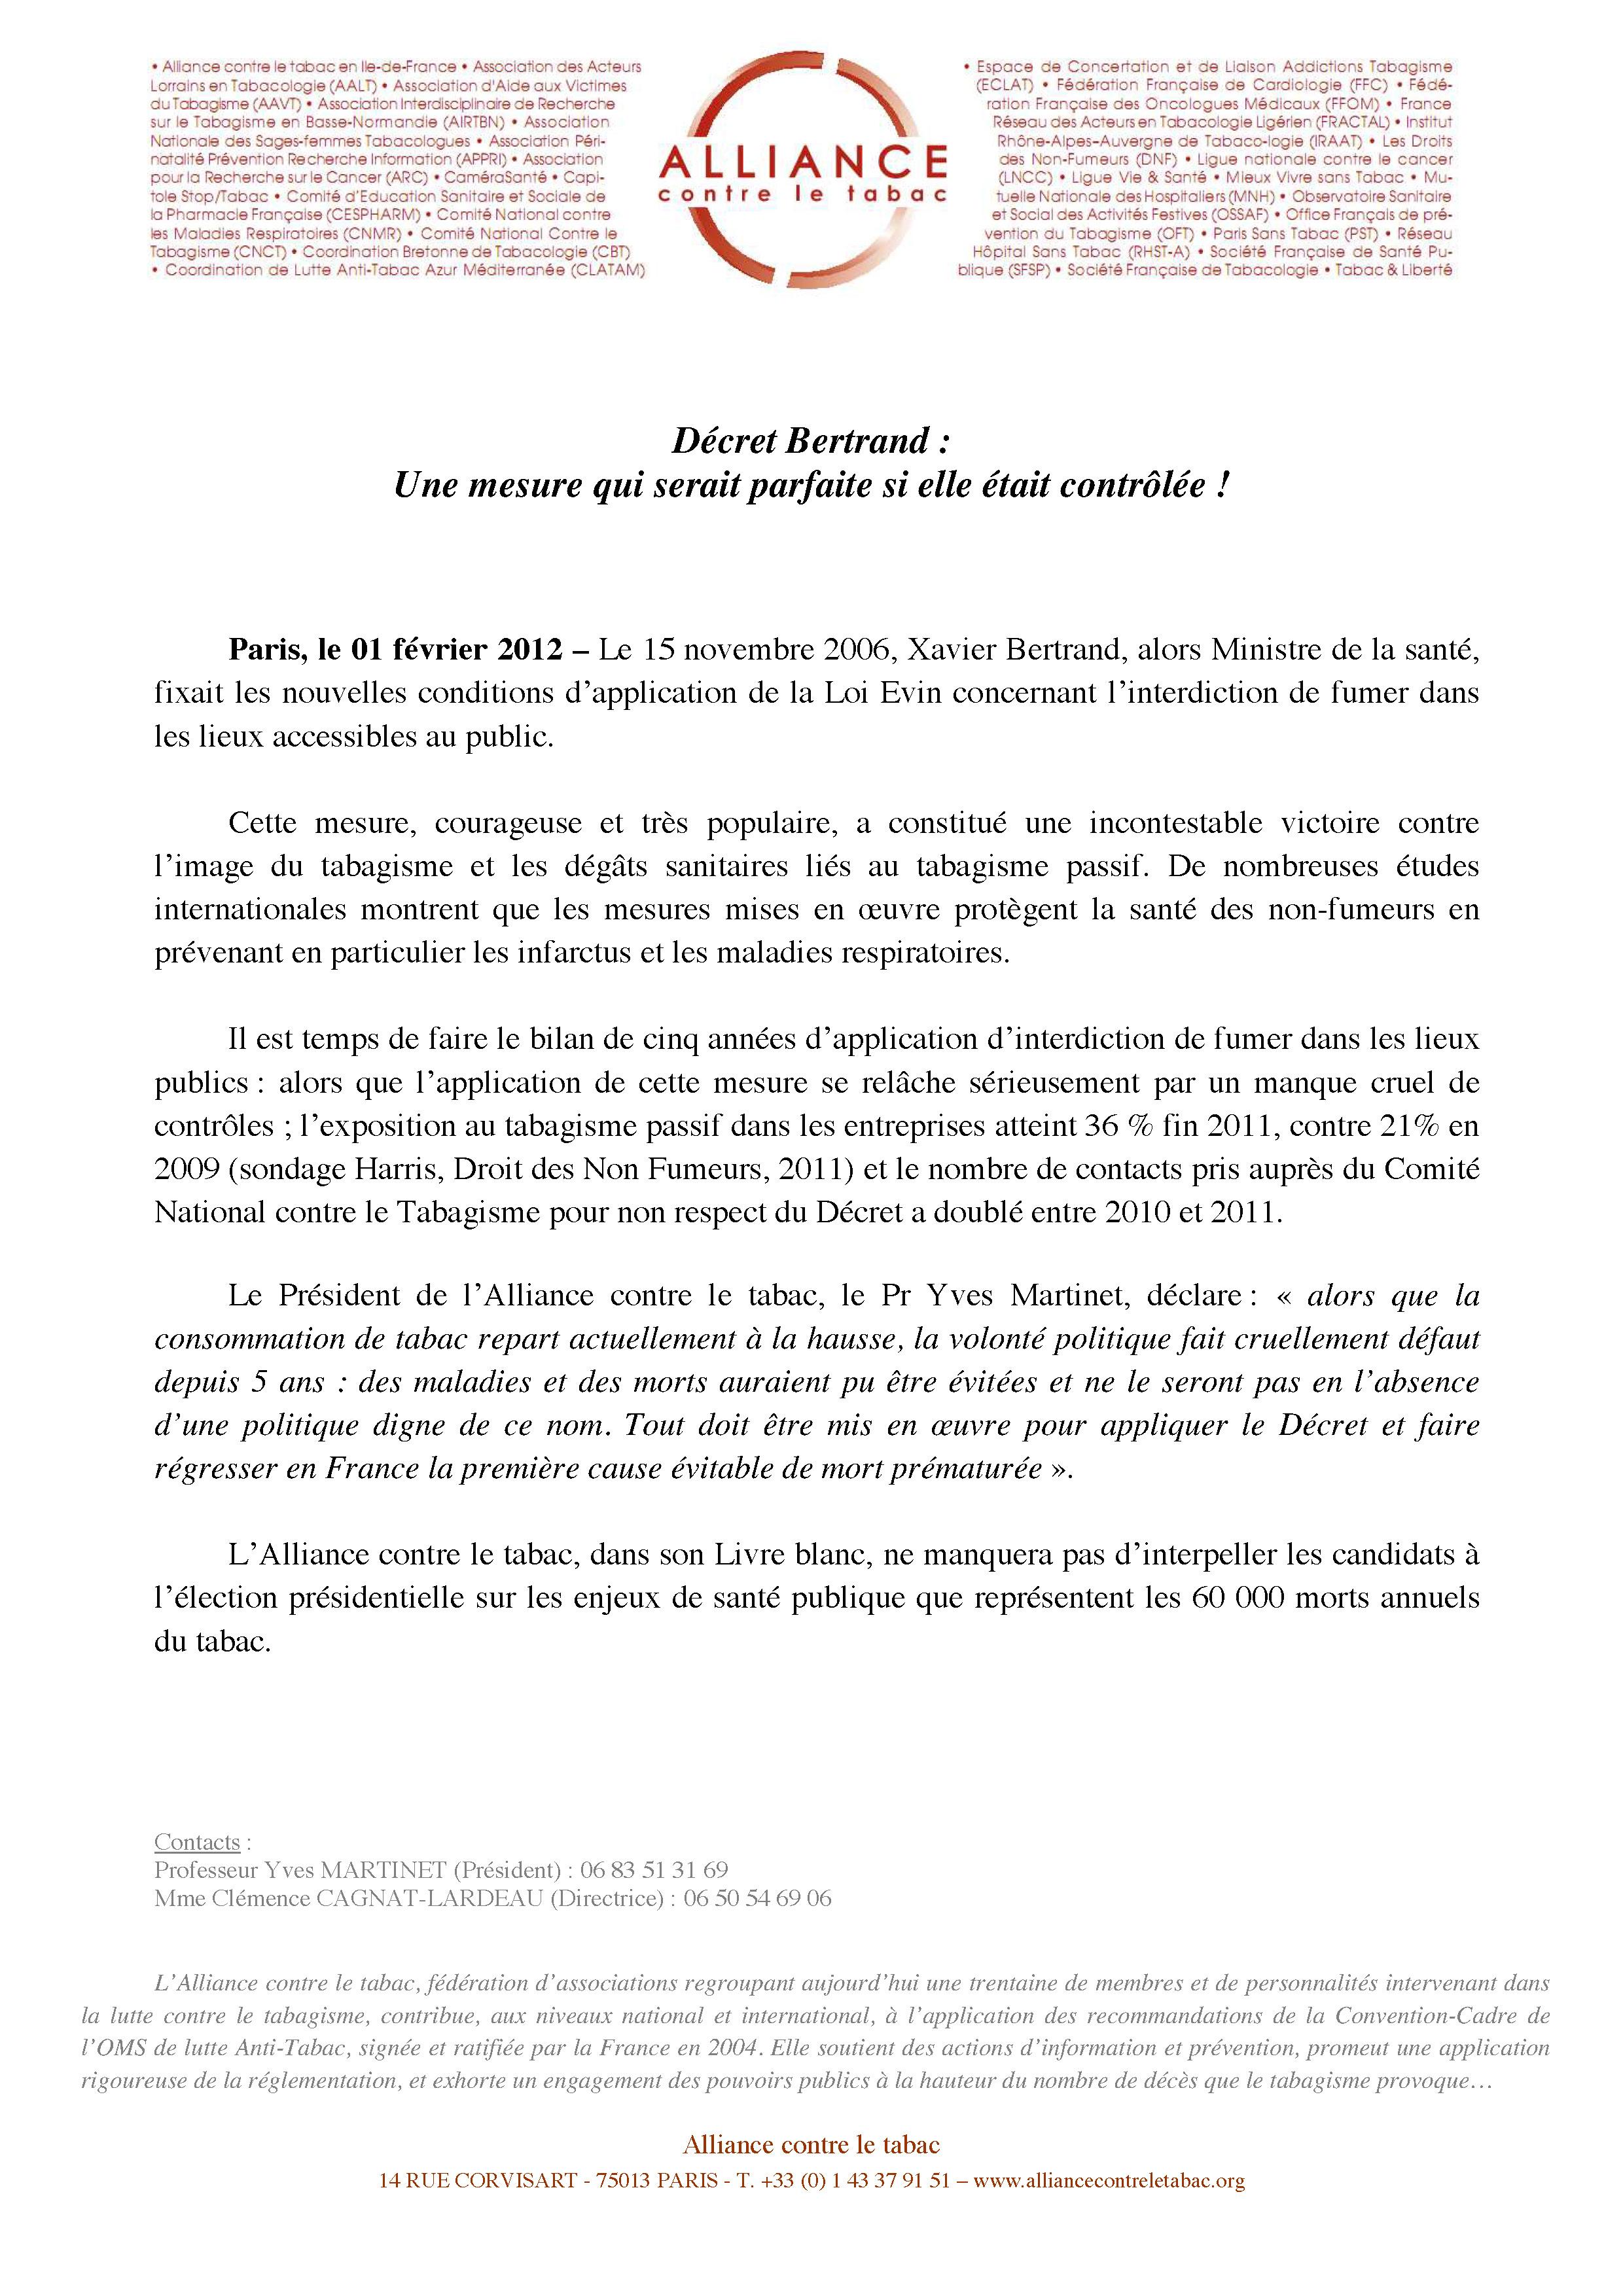 Alliance-CP_decret-bertrand-une-mesure-qui-serait-parfaite-si-elle-etait-controlee-01fev2012.jpg